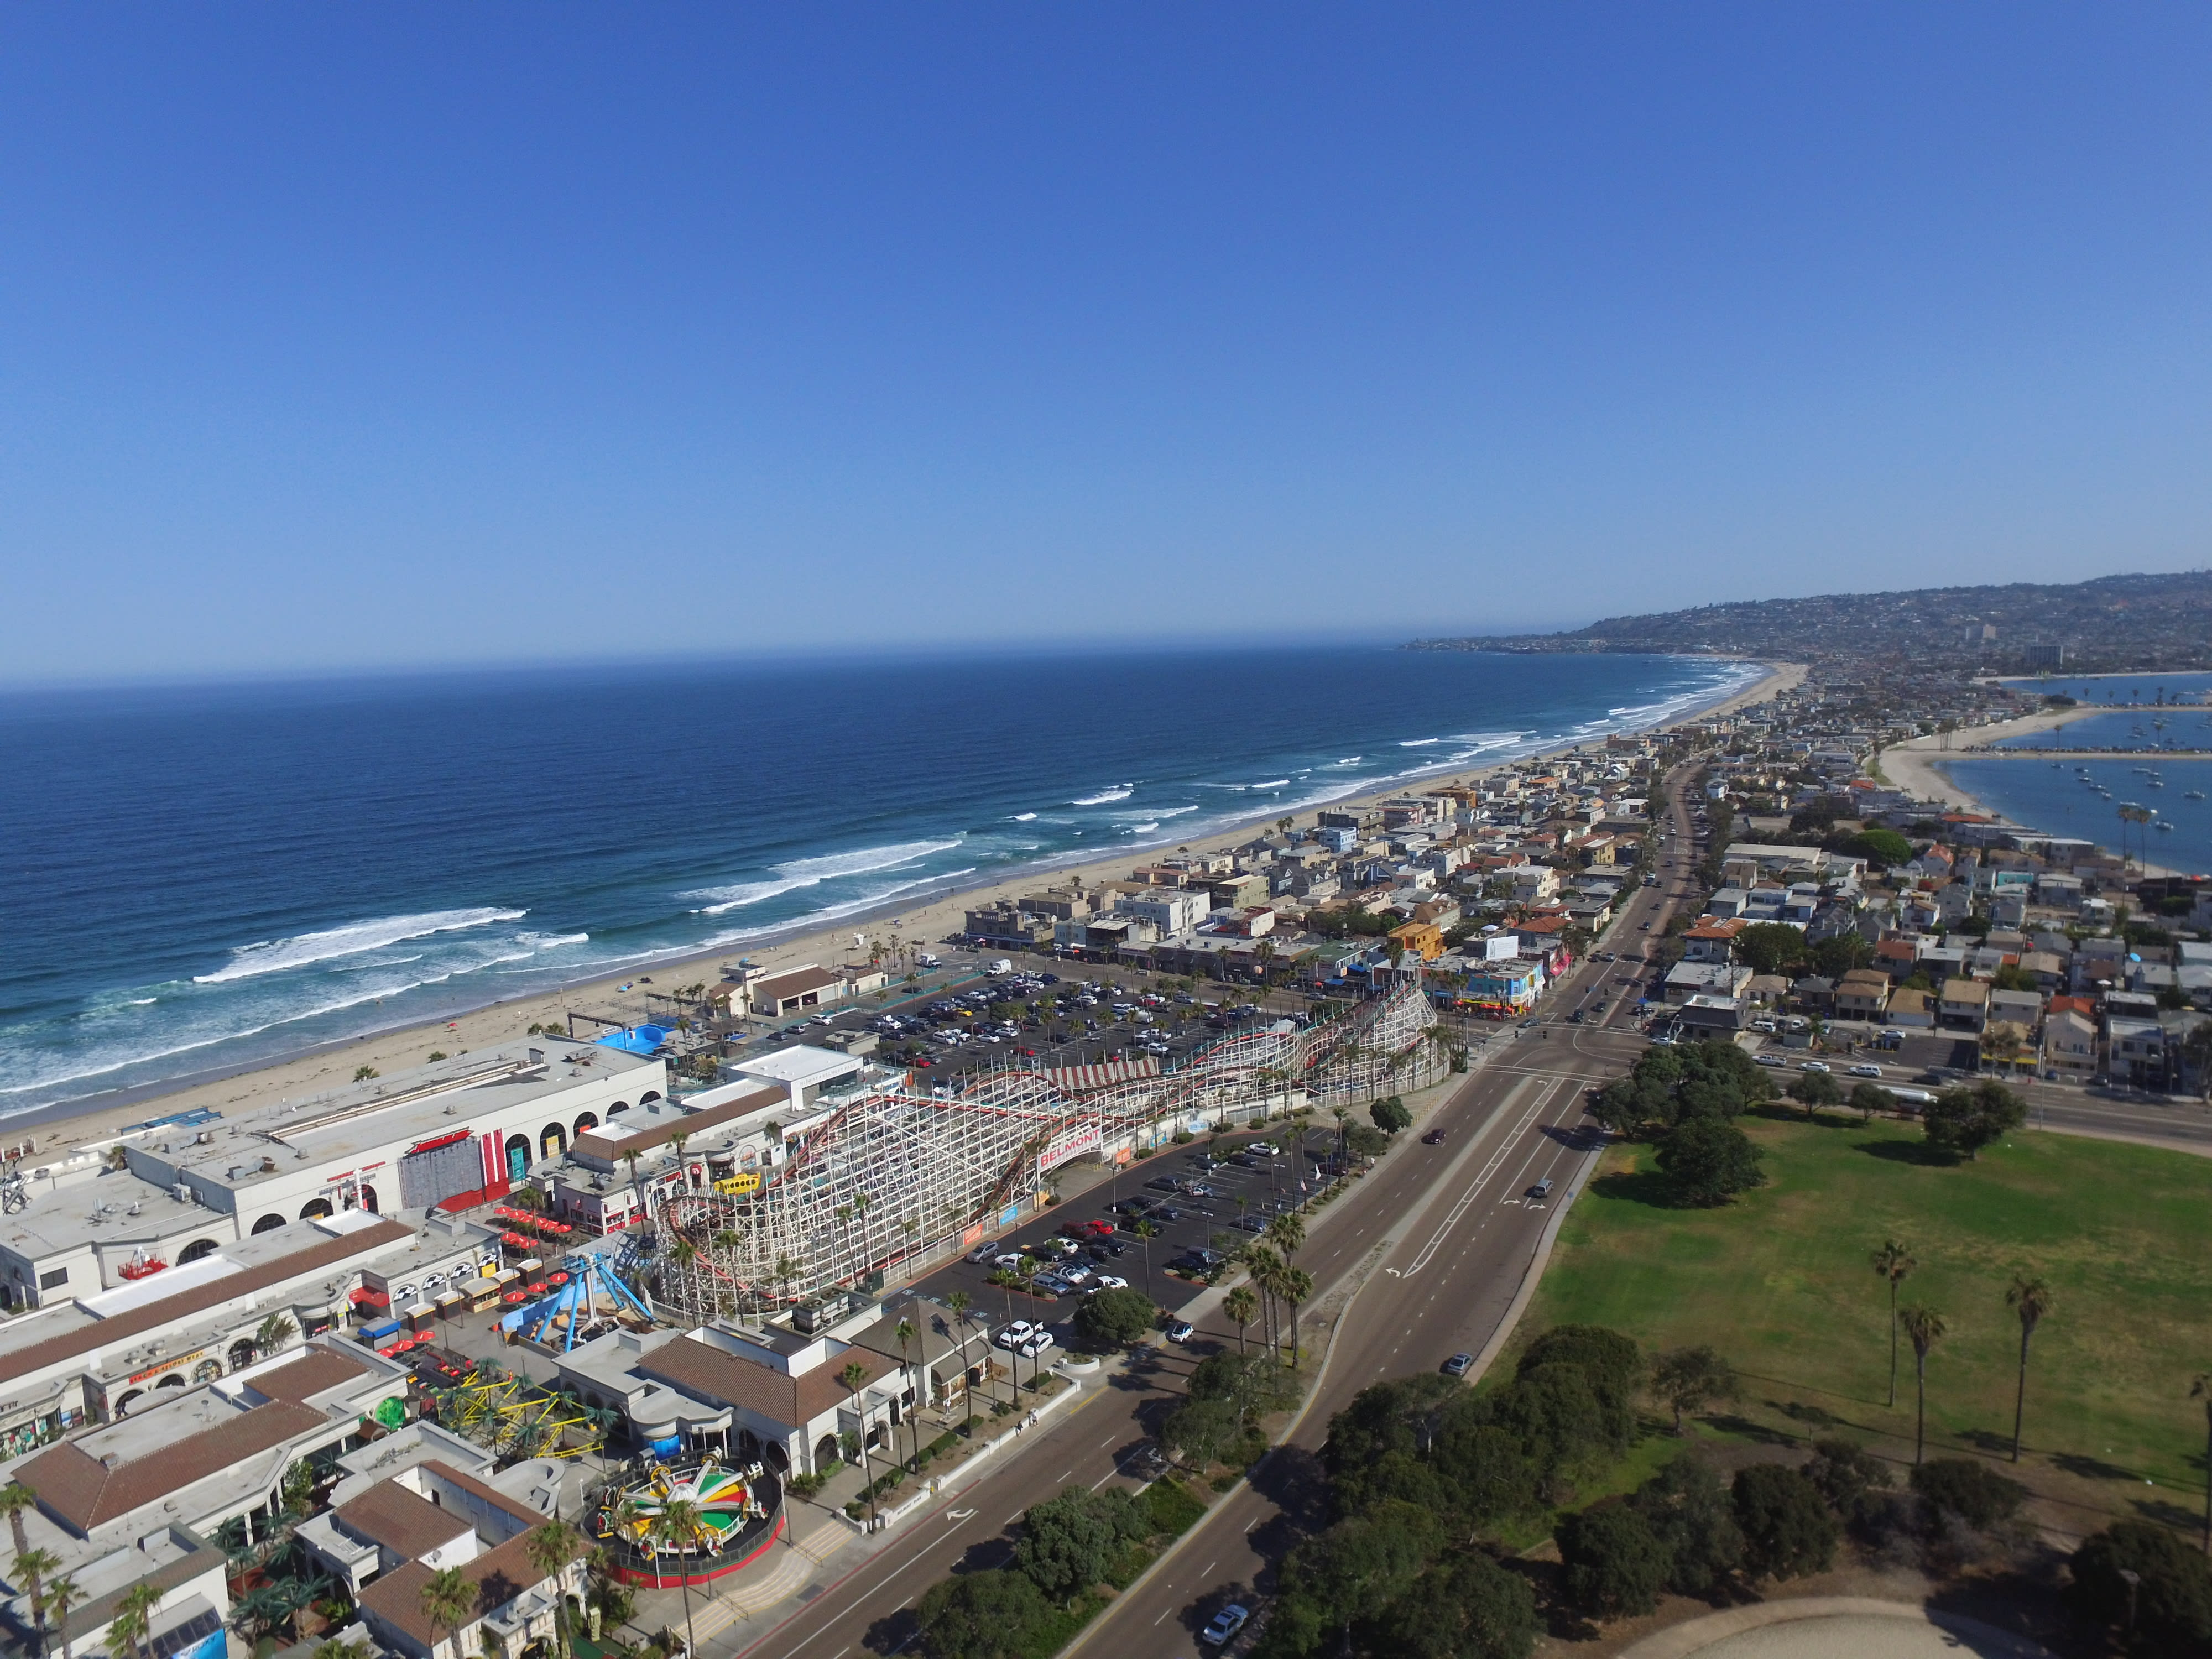 Cowabunga!: Surfing Course in Santa Monica, California